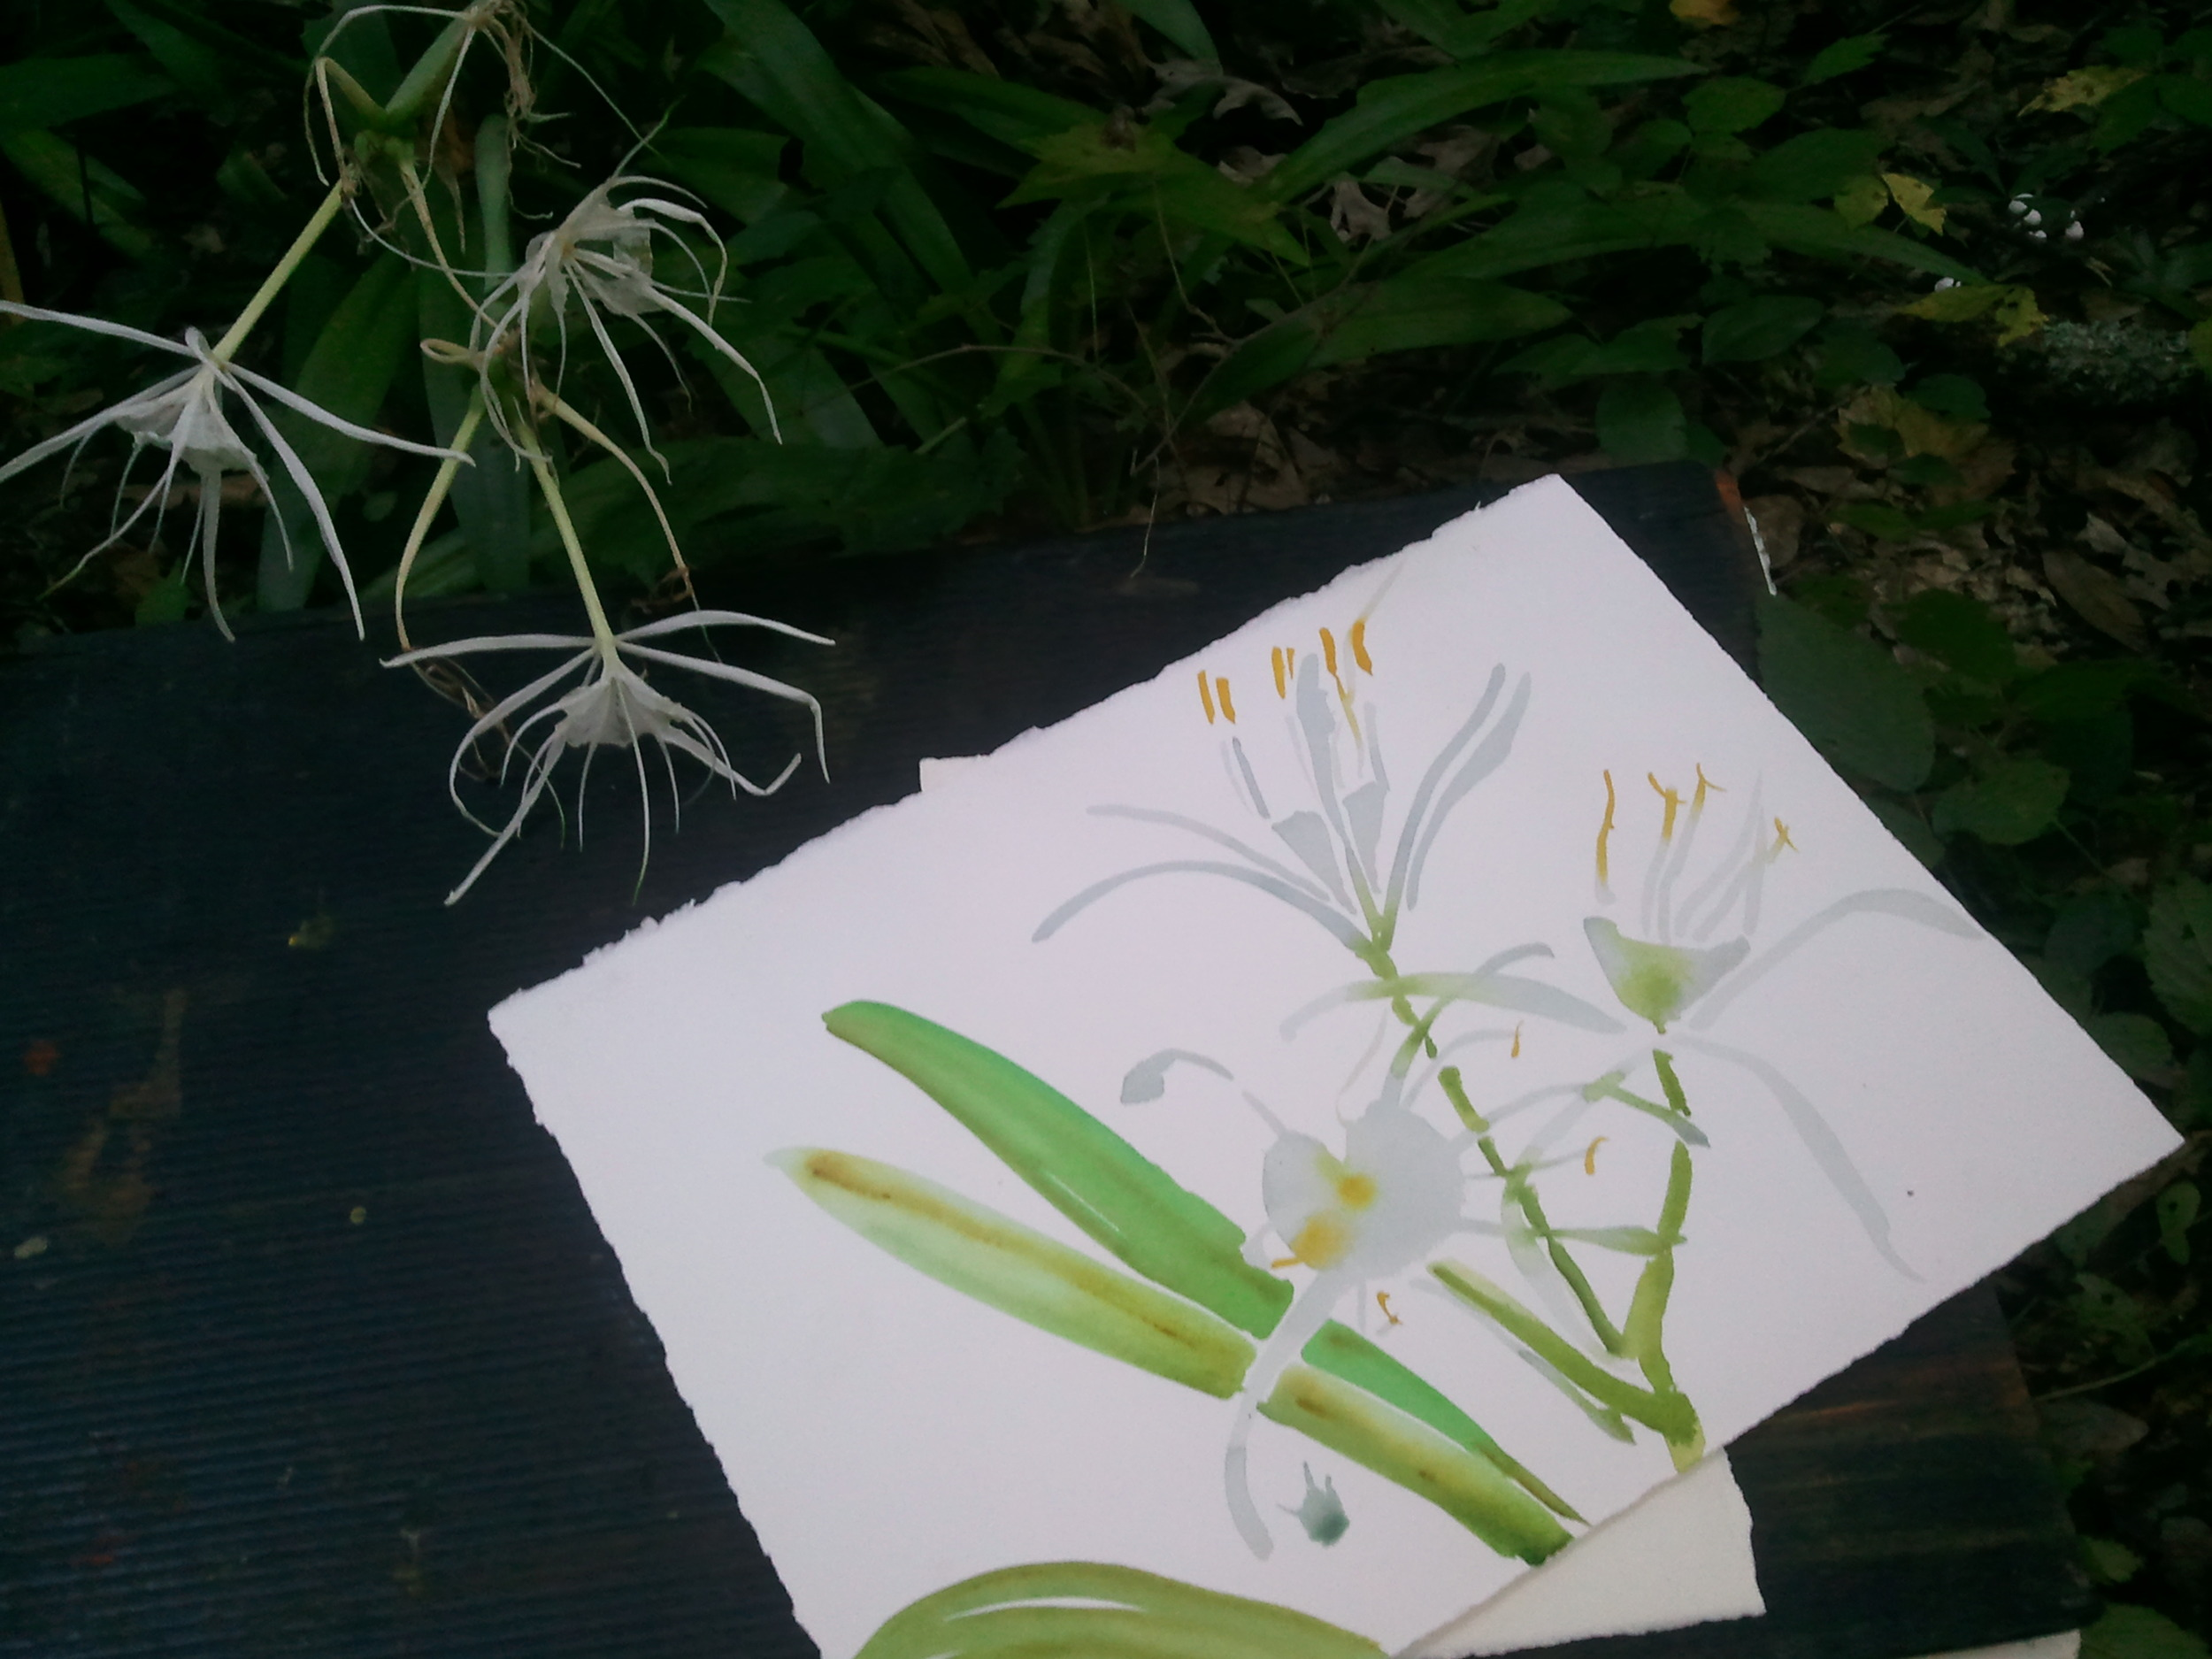 6:30 pm lily sketch